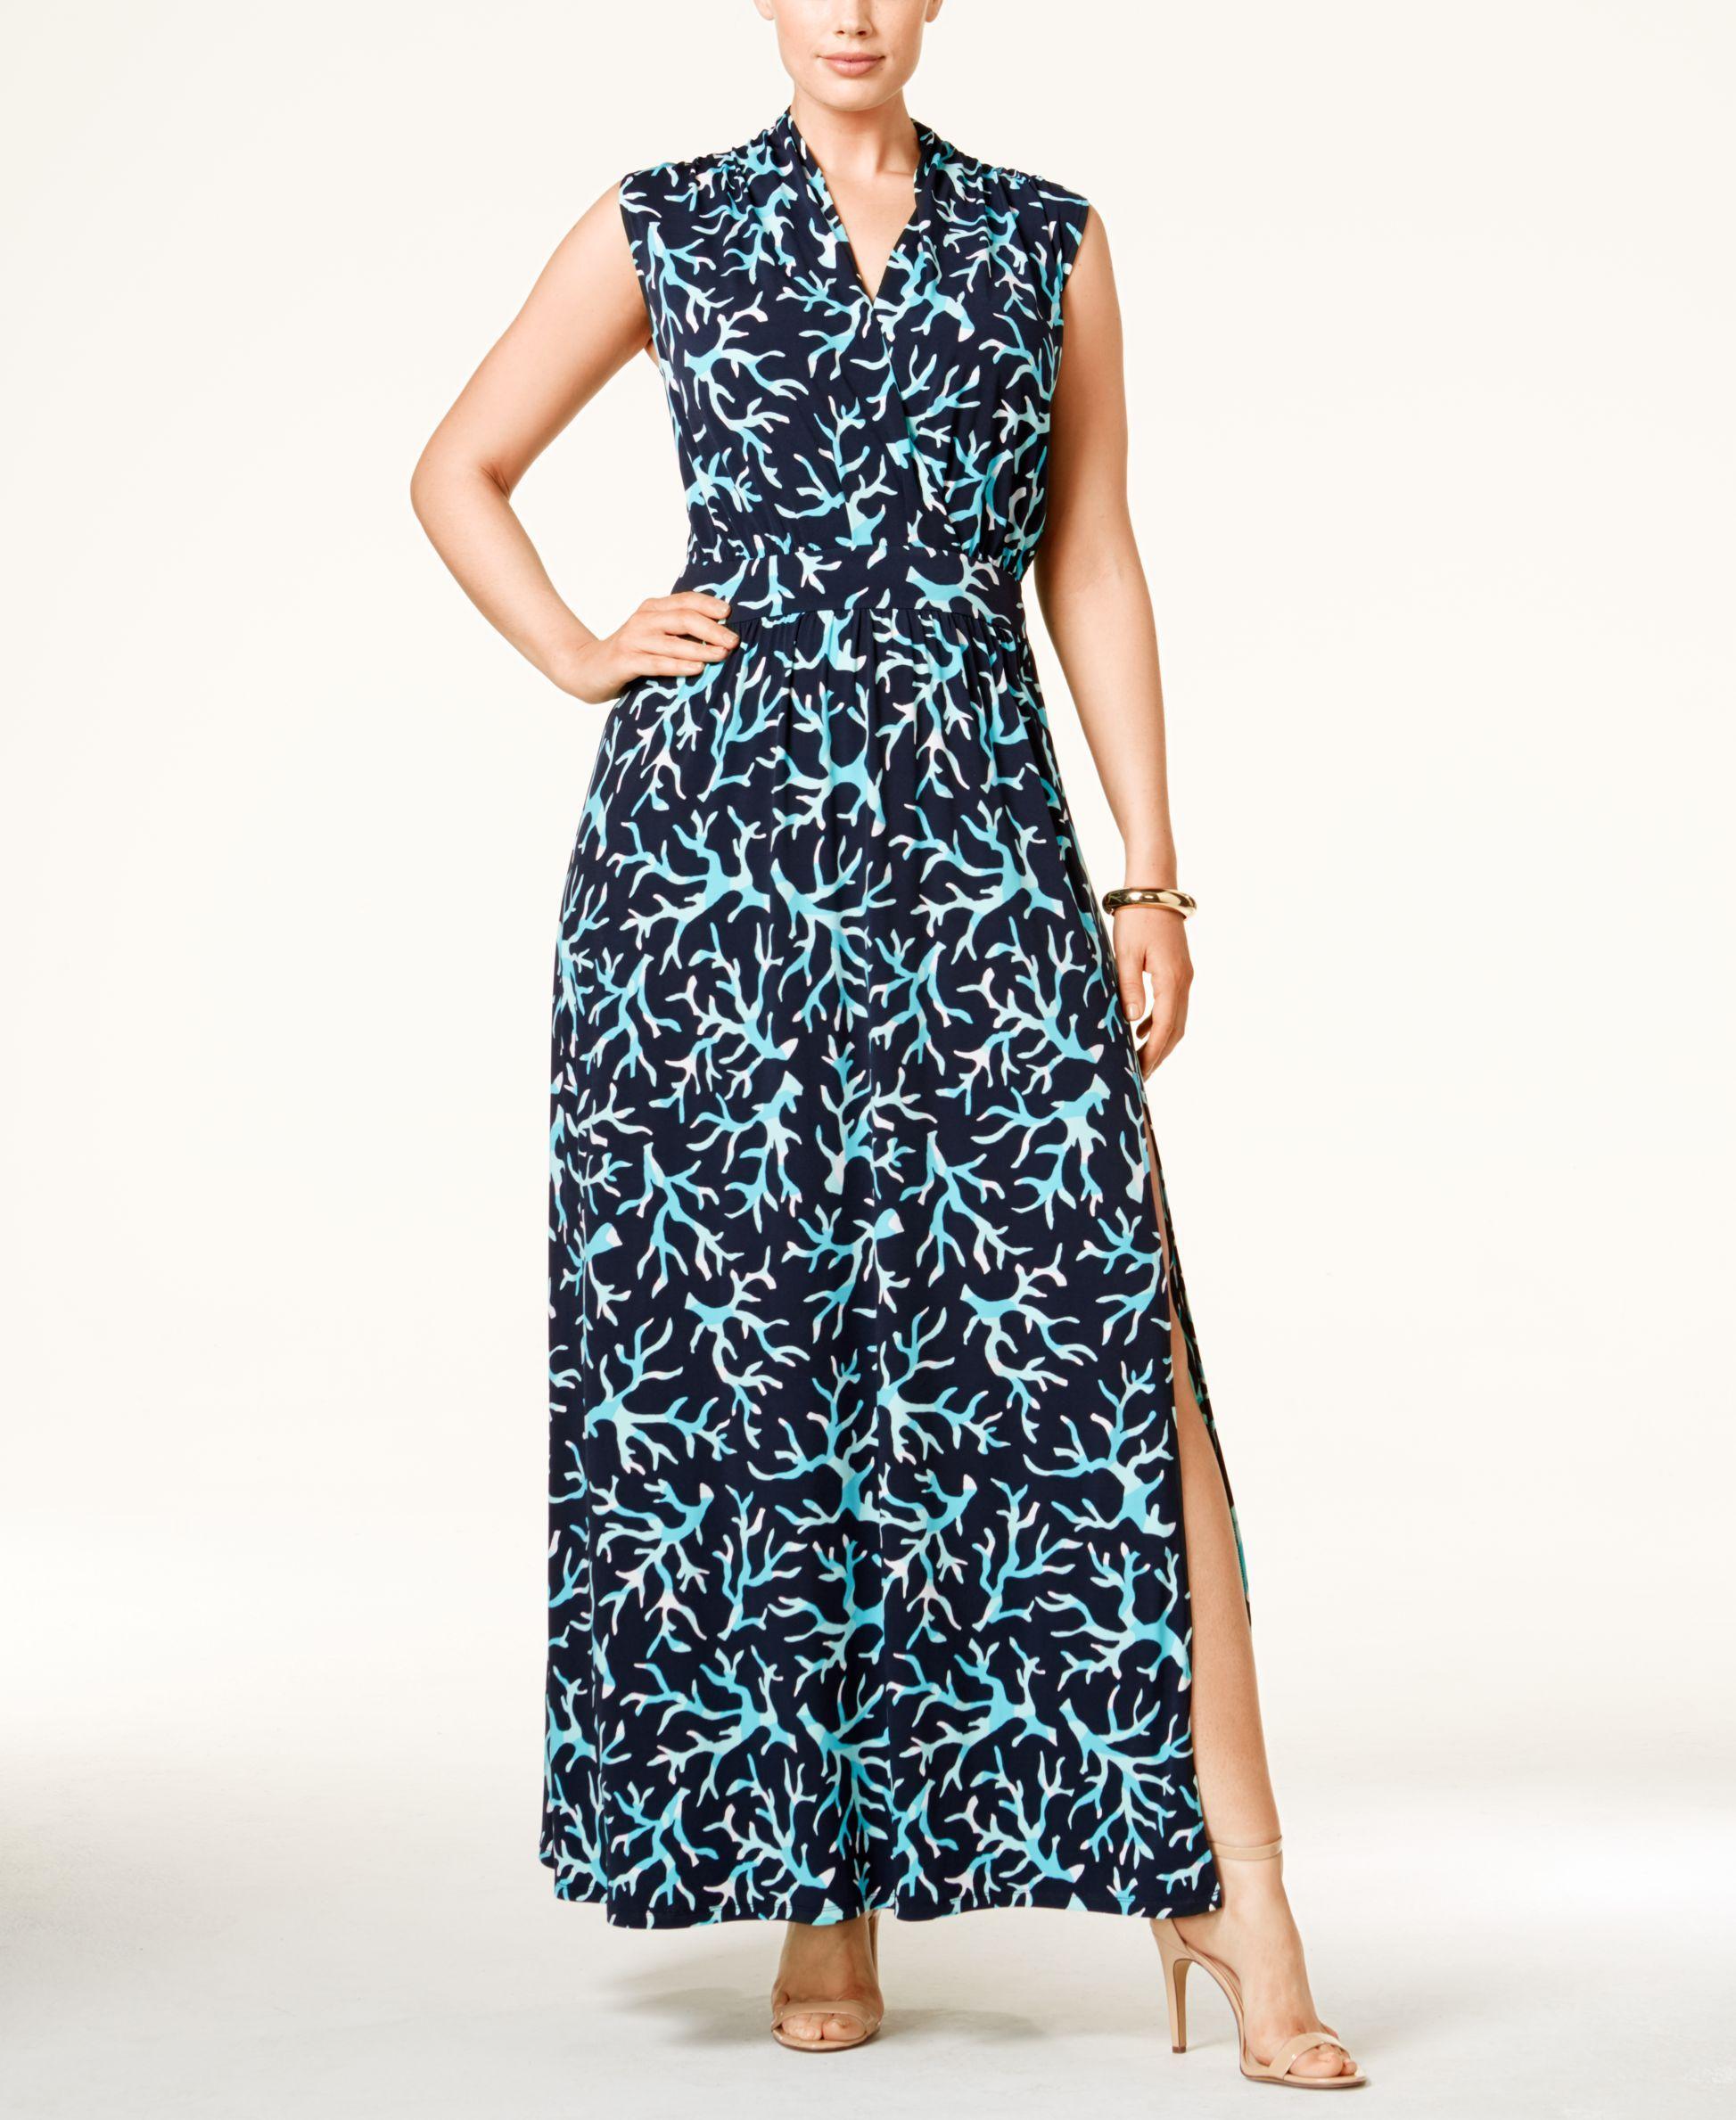 Trixxi juniorsu printed latticeback maxi dress products